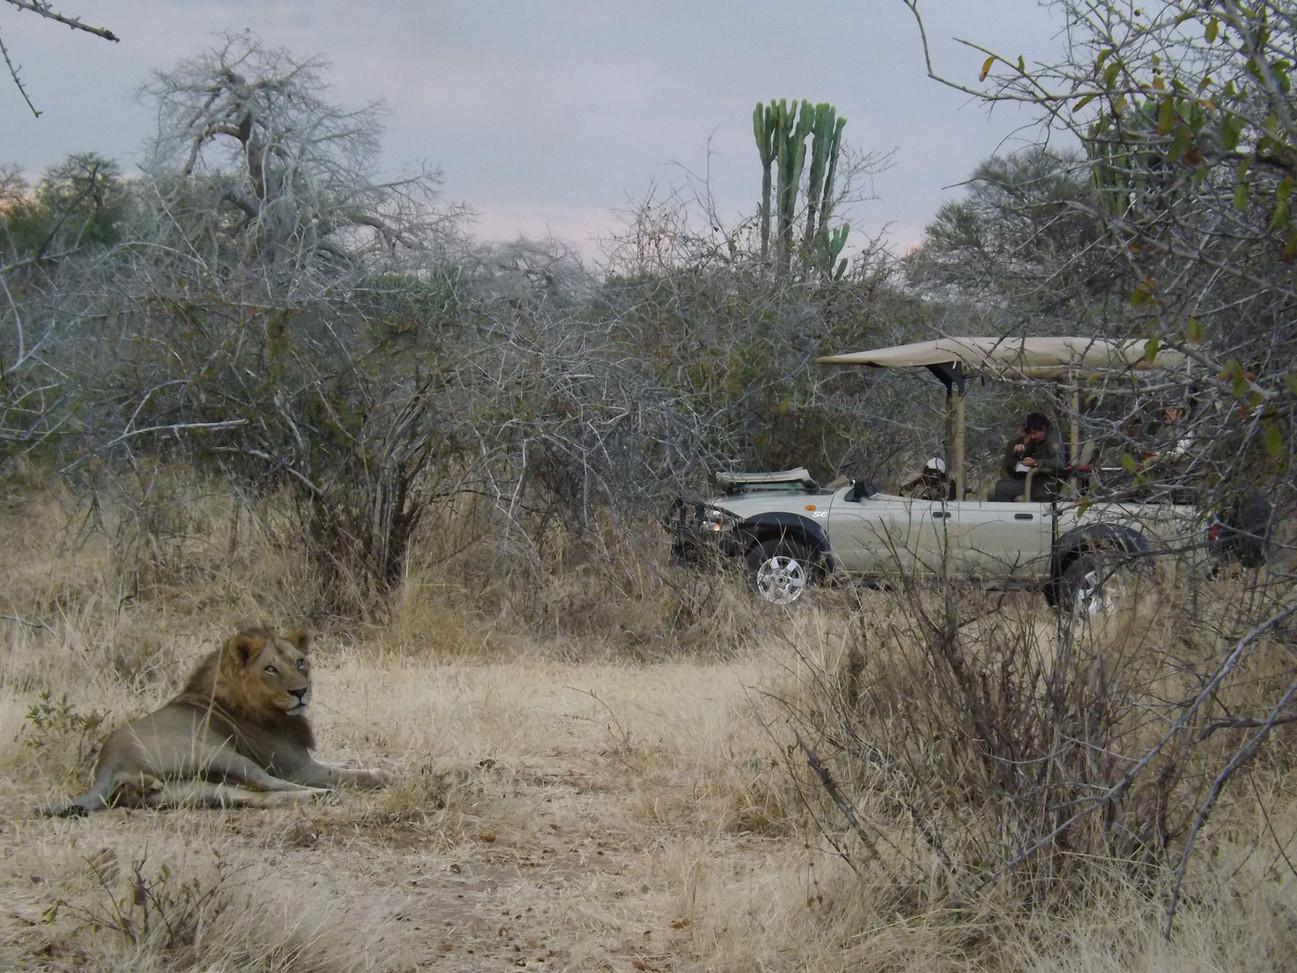 4x4 Safari Ruaha Jongomero Tanzania